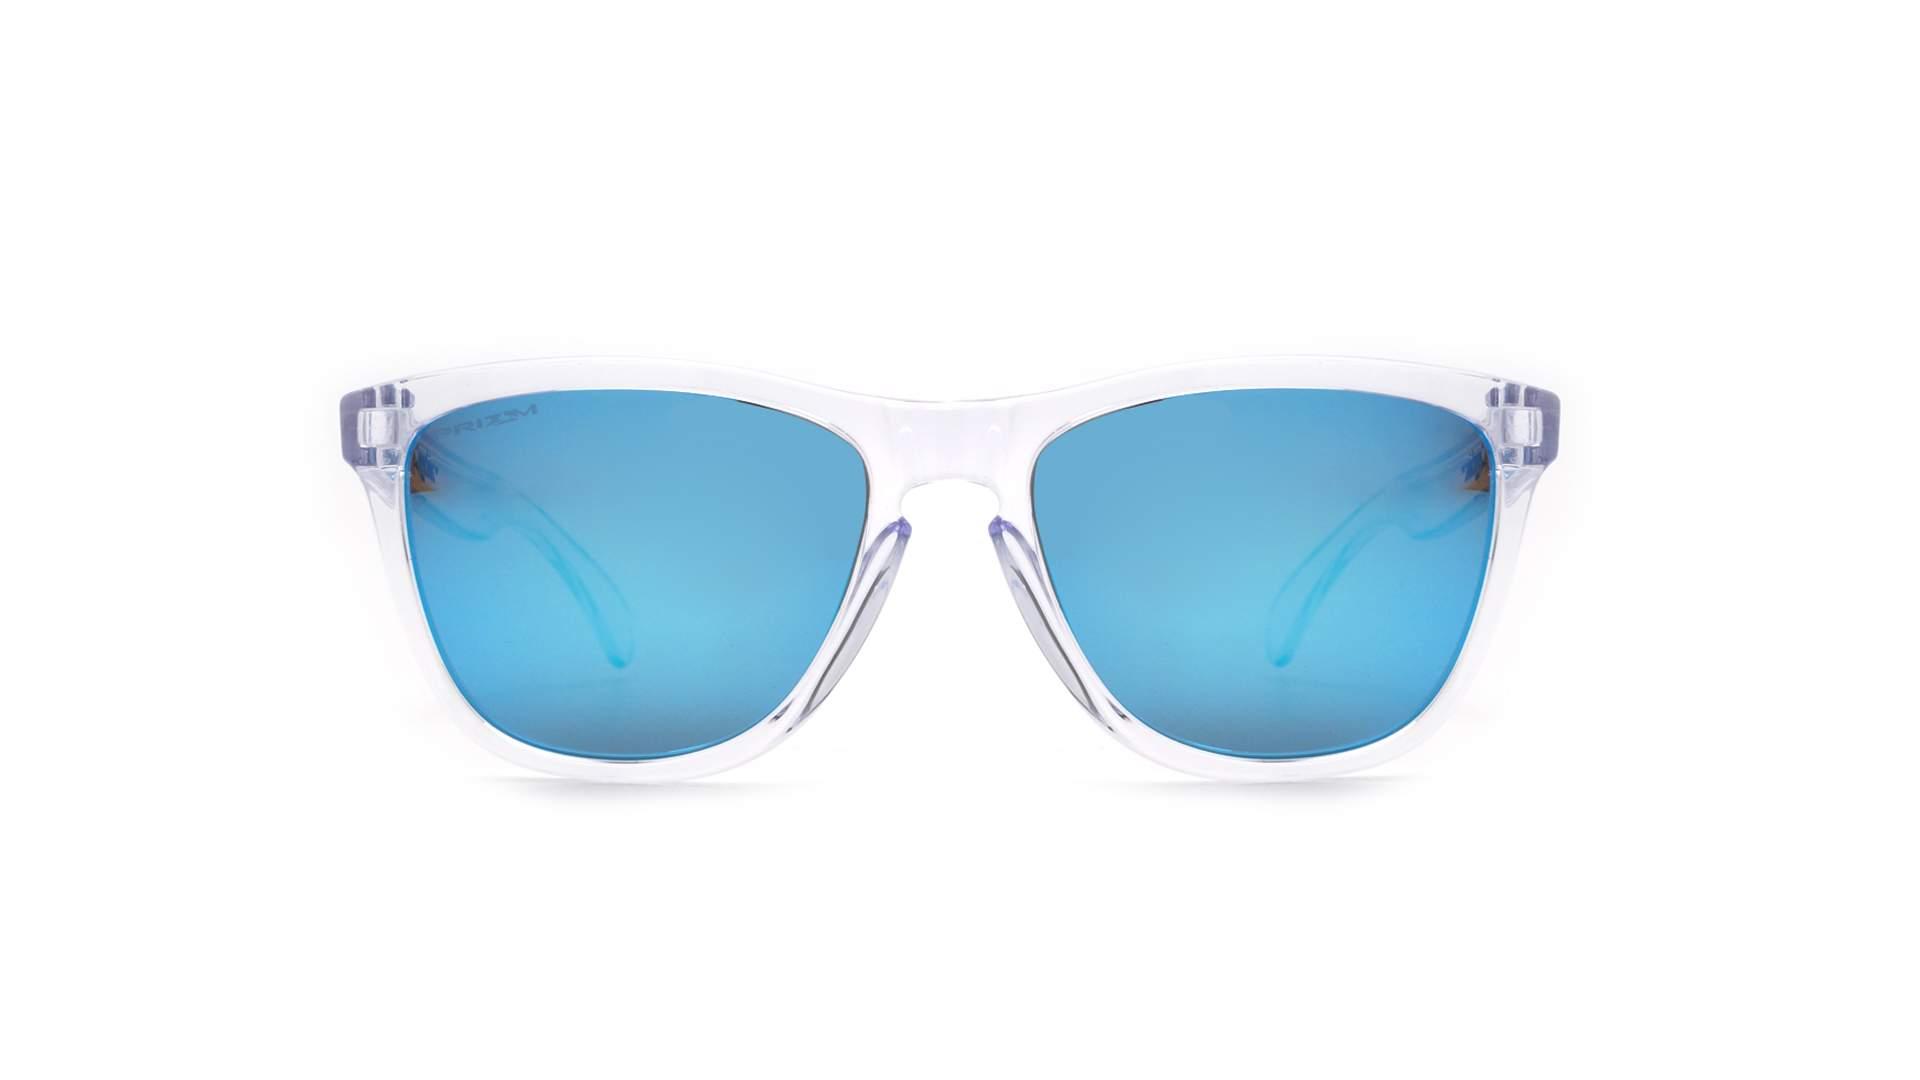 42454e51bd Sunglasses Oakley Frogskins Crystal clear Clear Prizm OO9013 D0 55-17  Medium Mirror